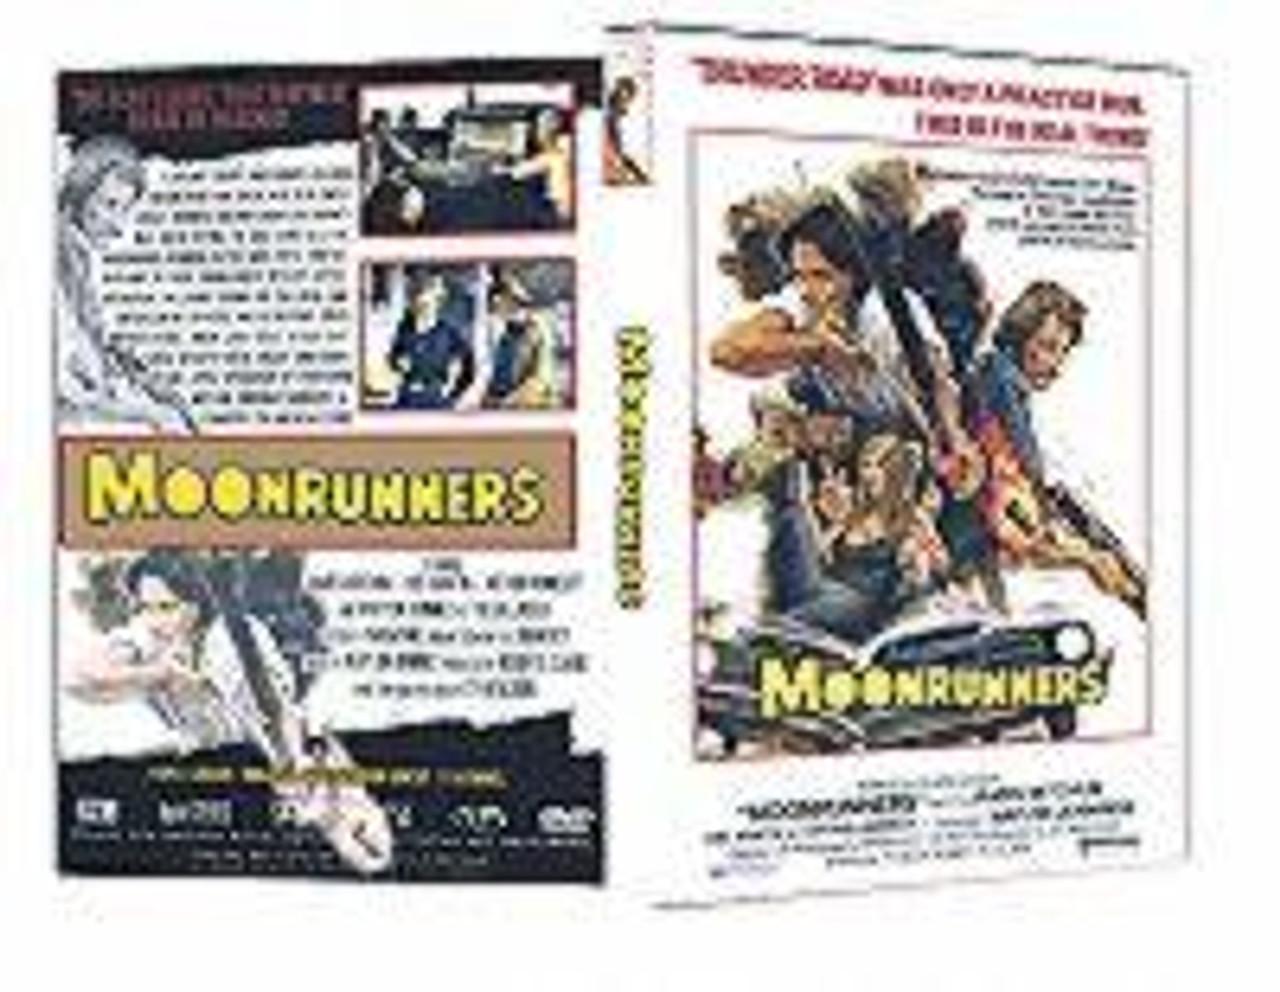 MOONRUNNERS Movie DVD